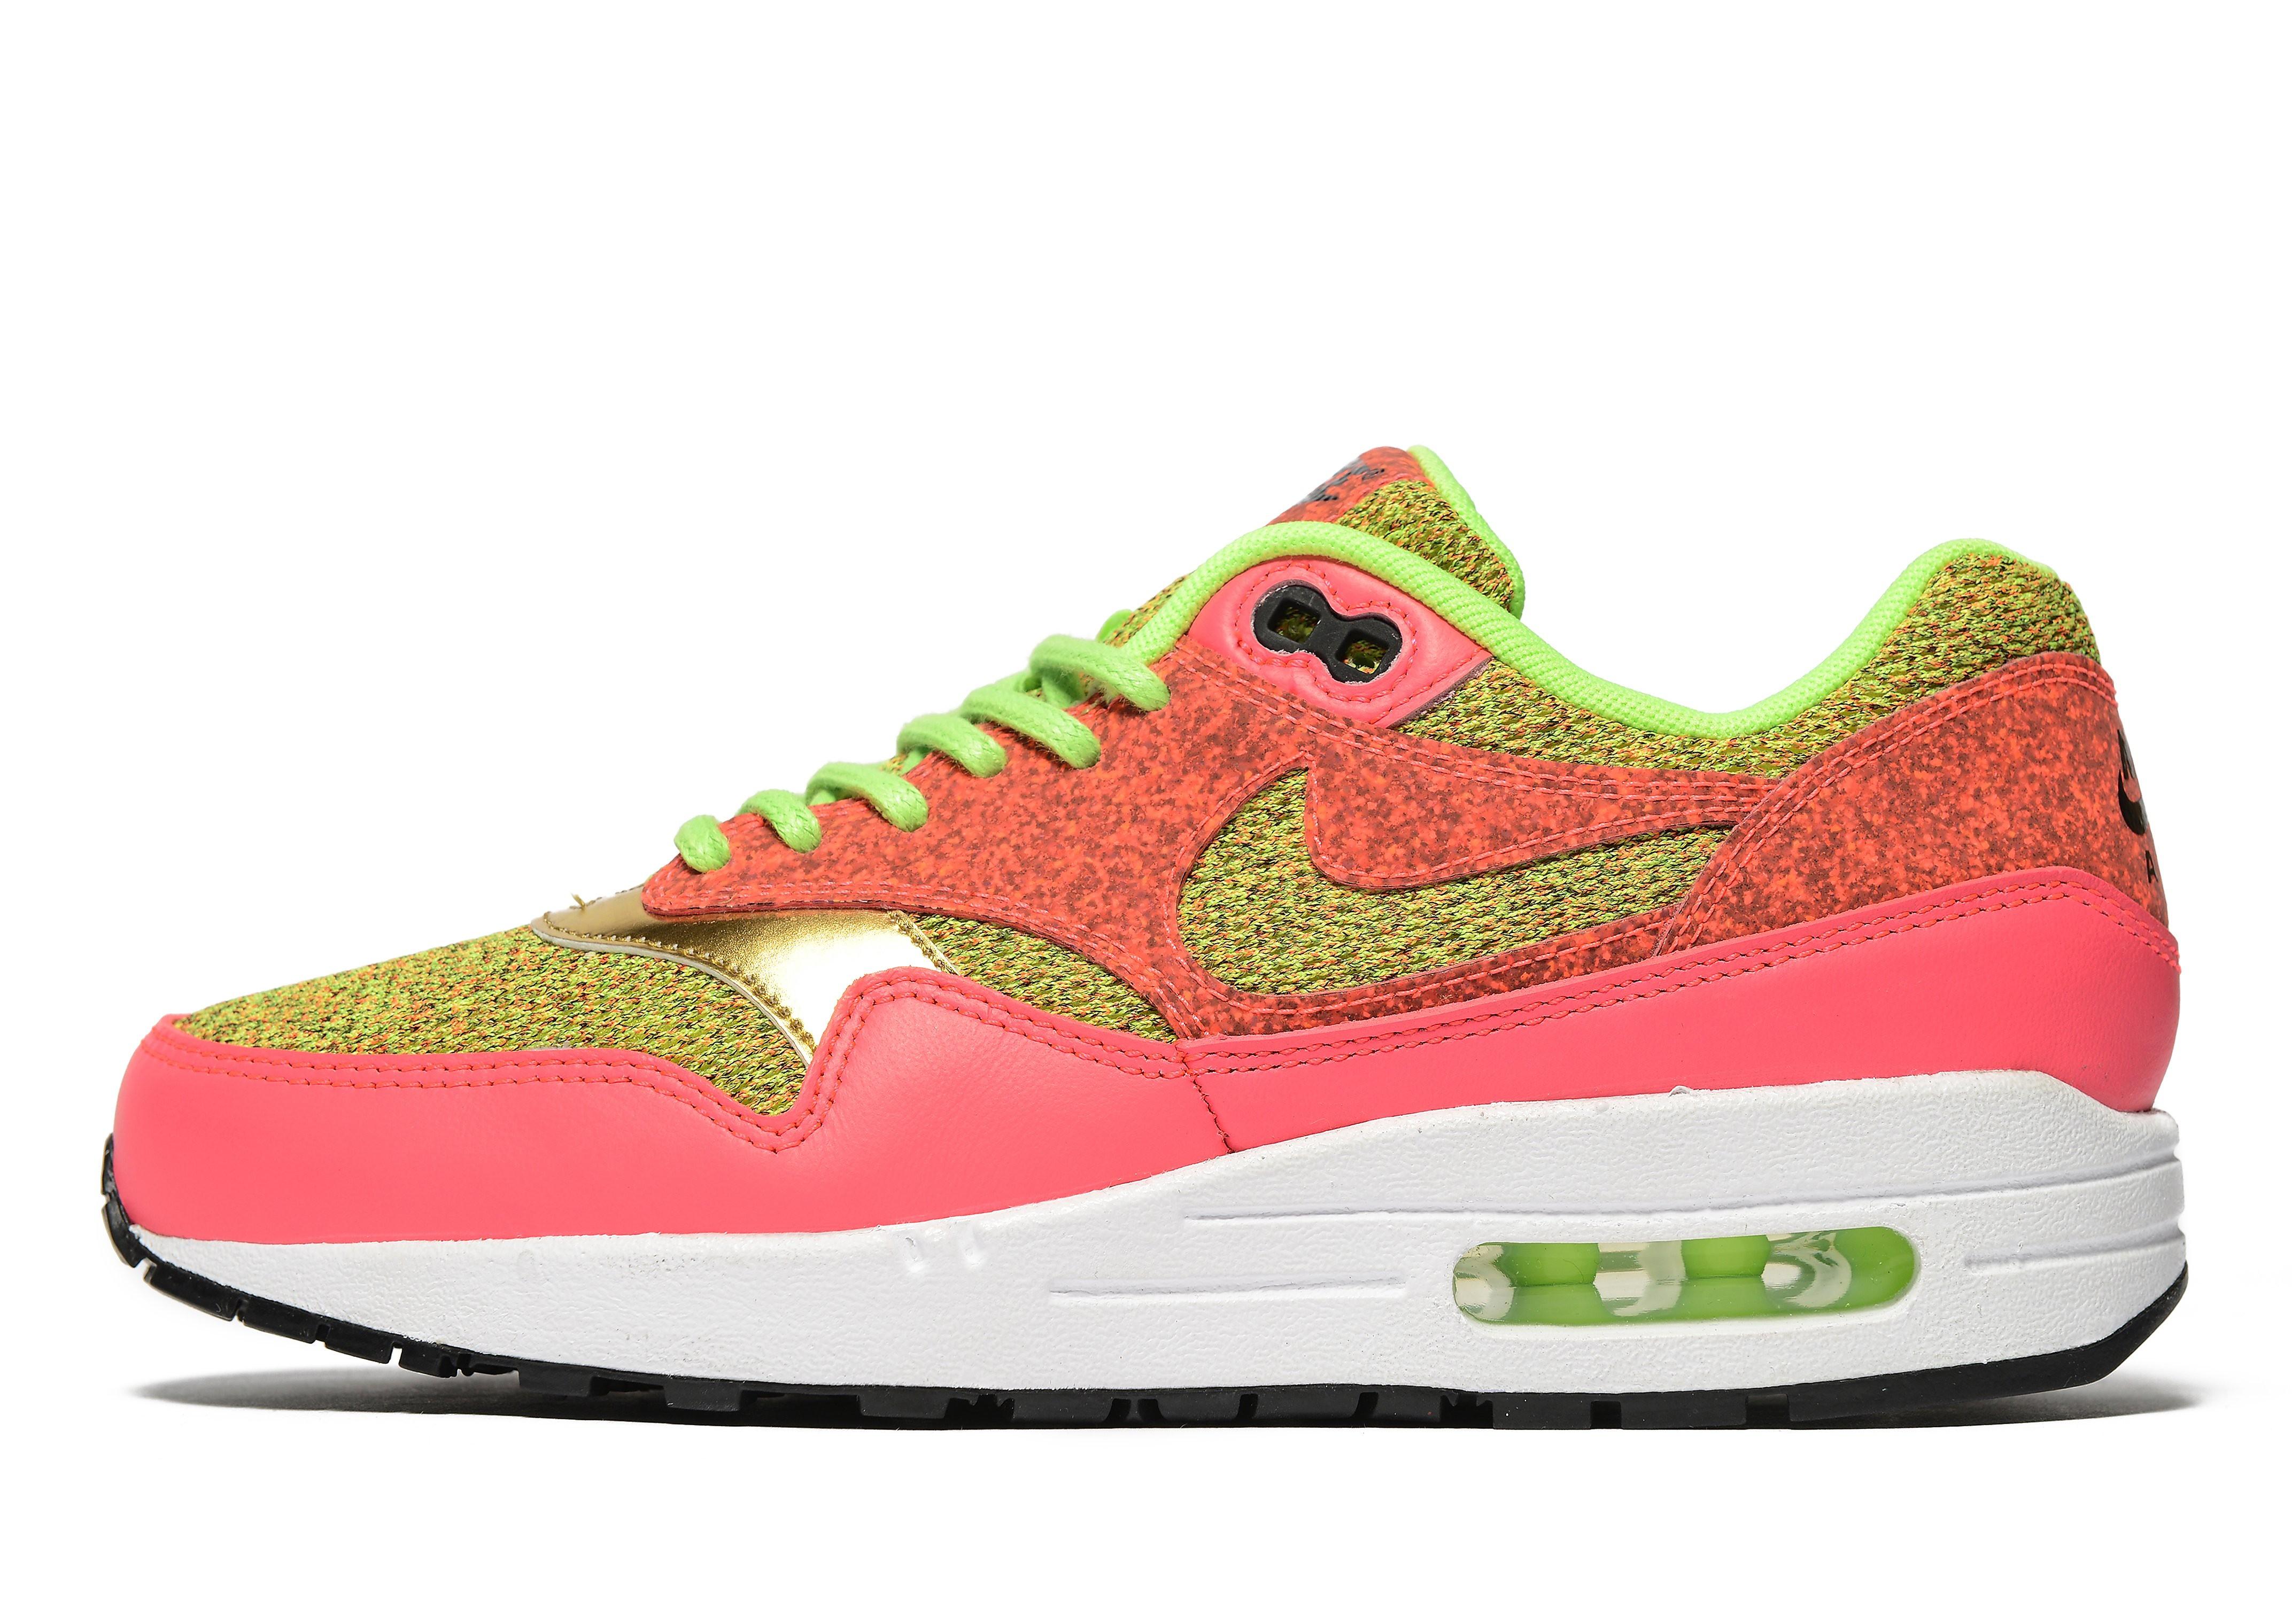 Nike Air Max 1 SE Women's